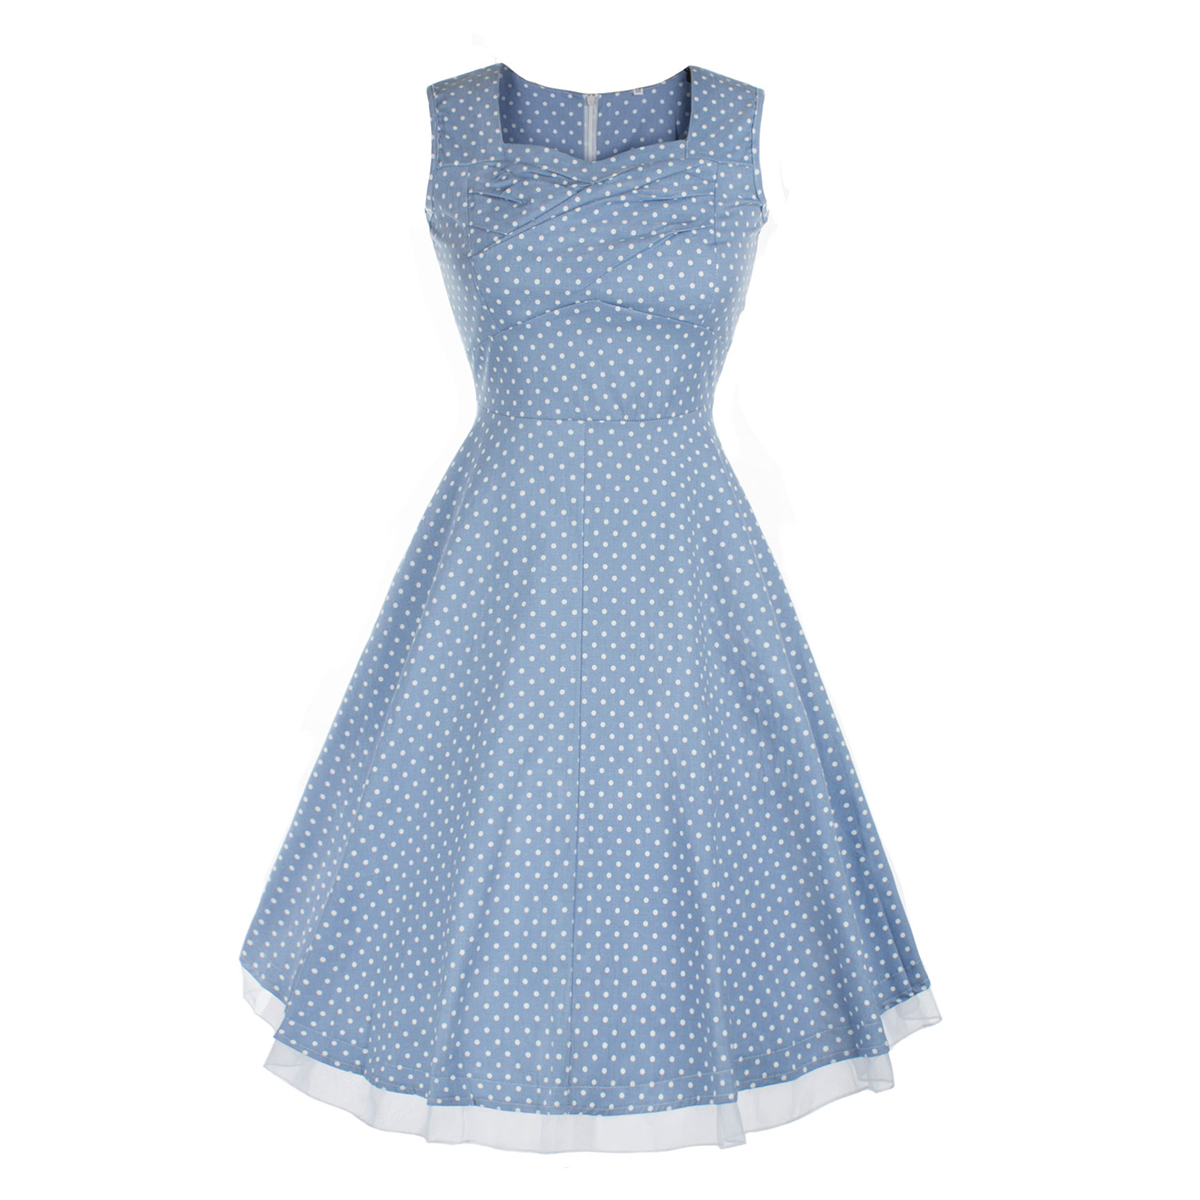 1950s 1960s Women Vintage Swing Dress Pinup Rockabilly Cocktail ...